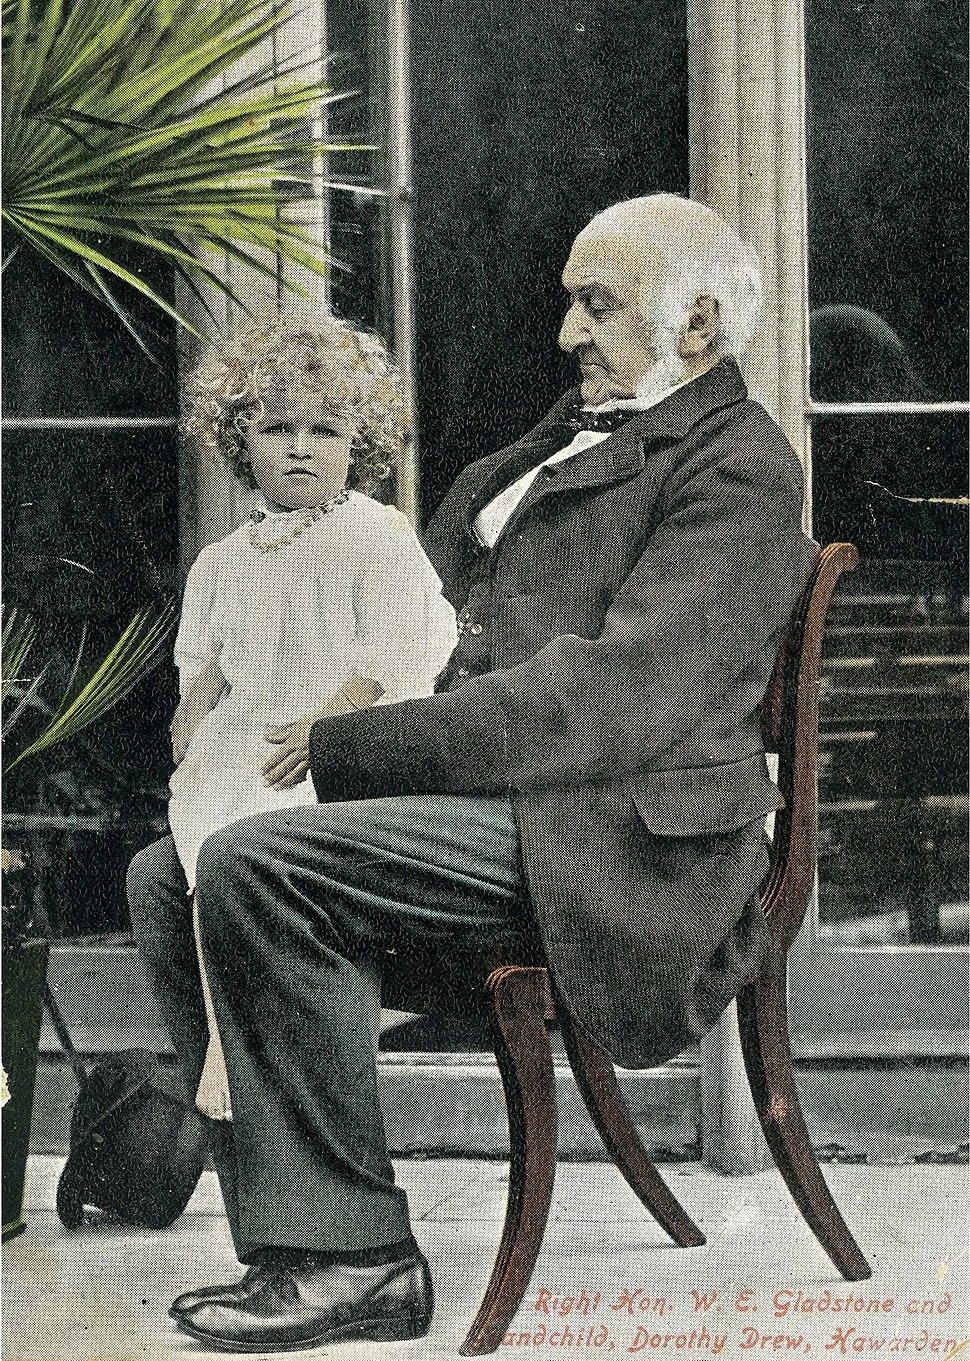 W E Gladstone and Dorothy Drew